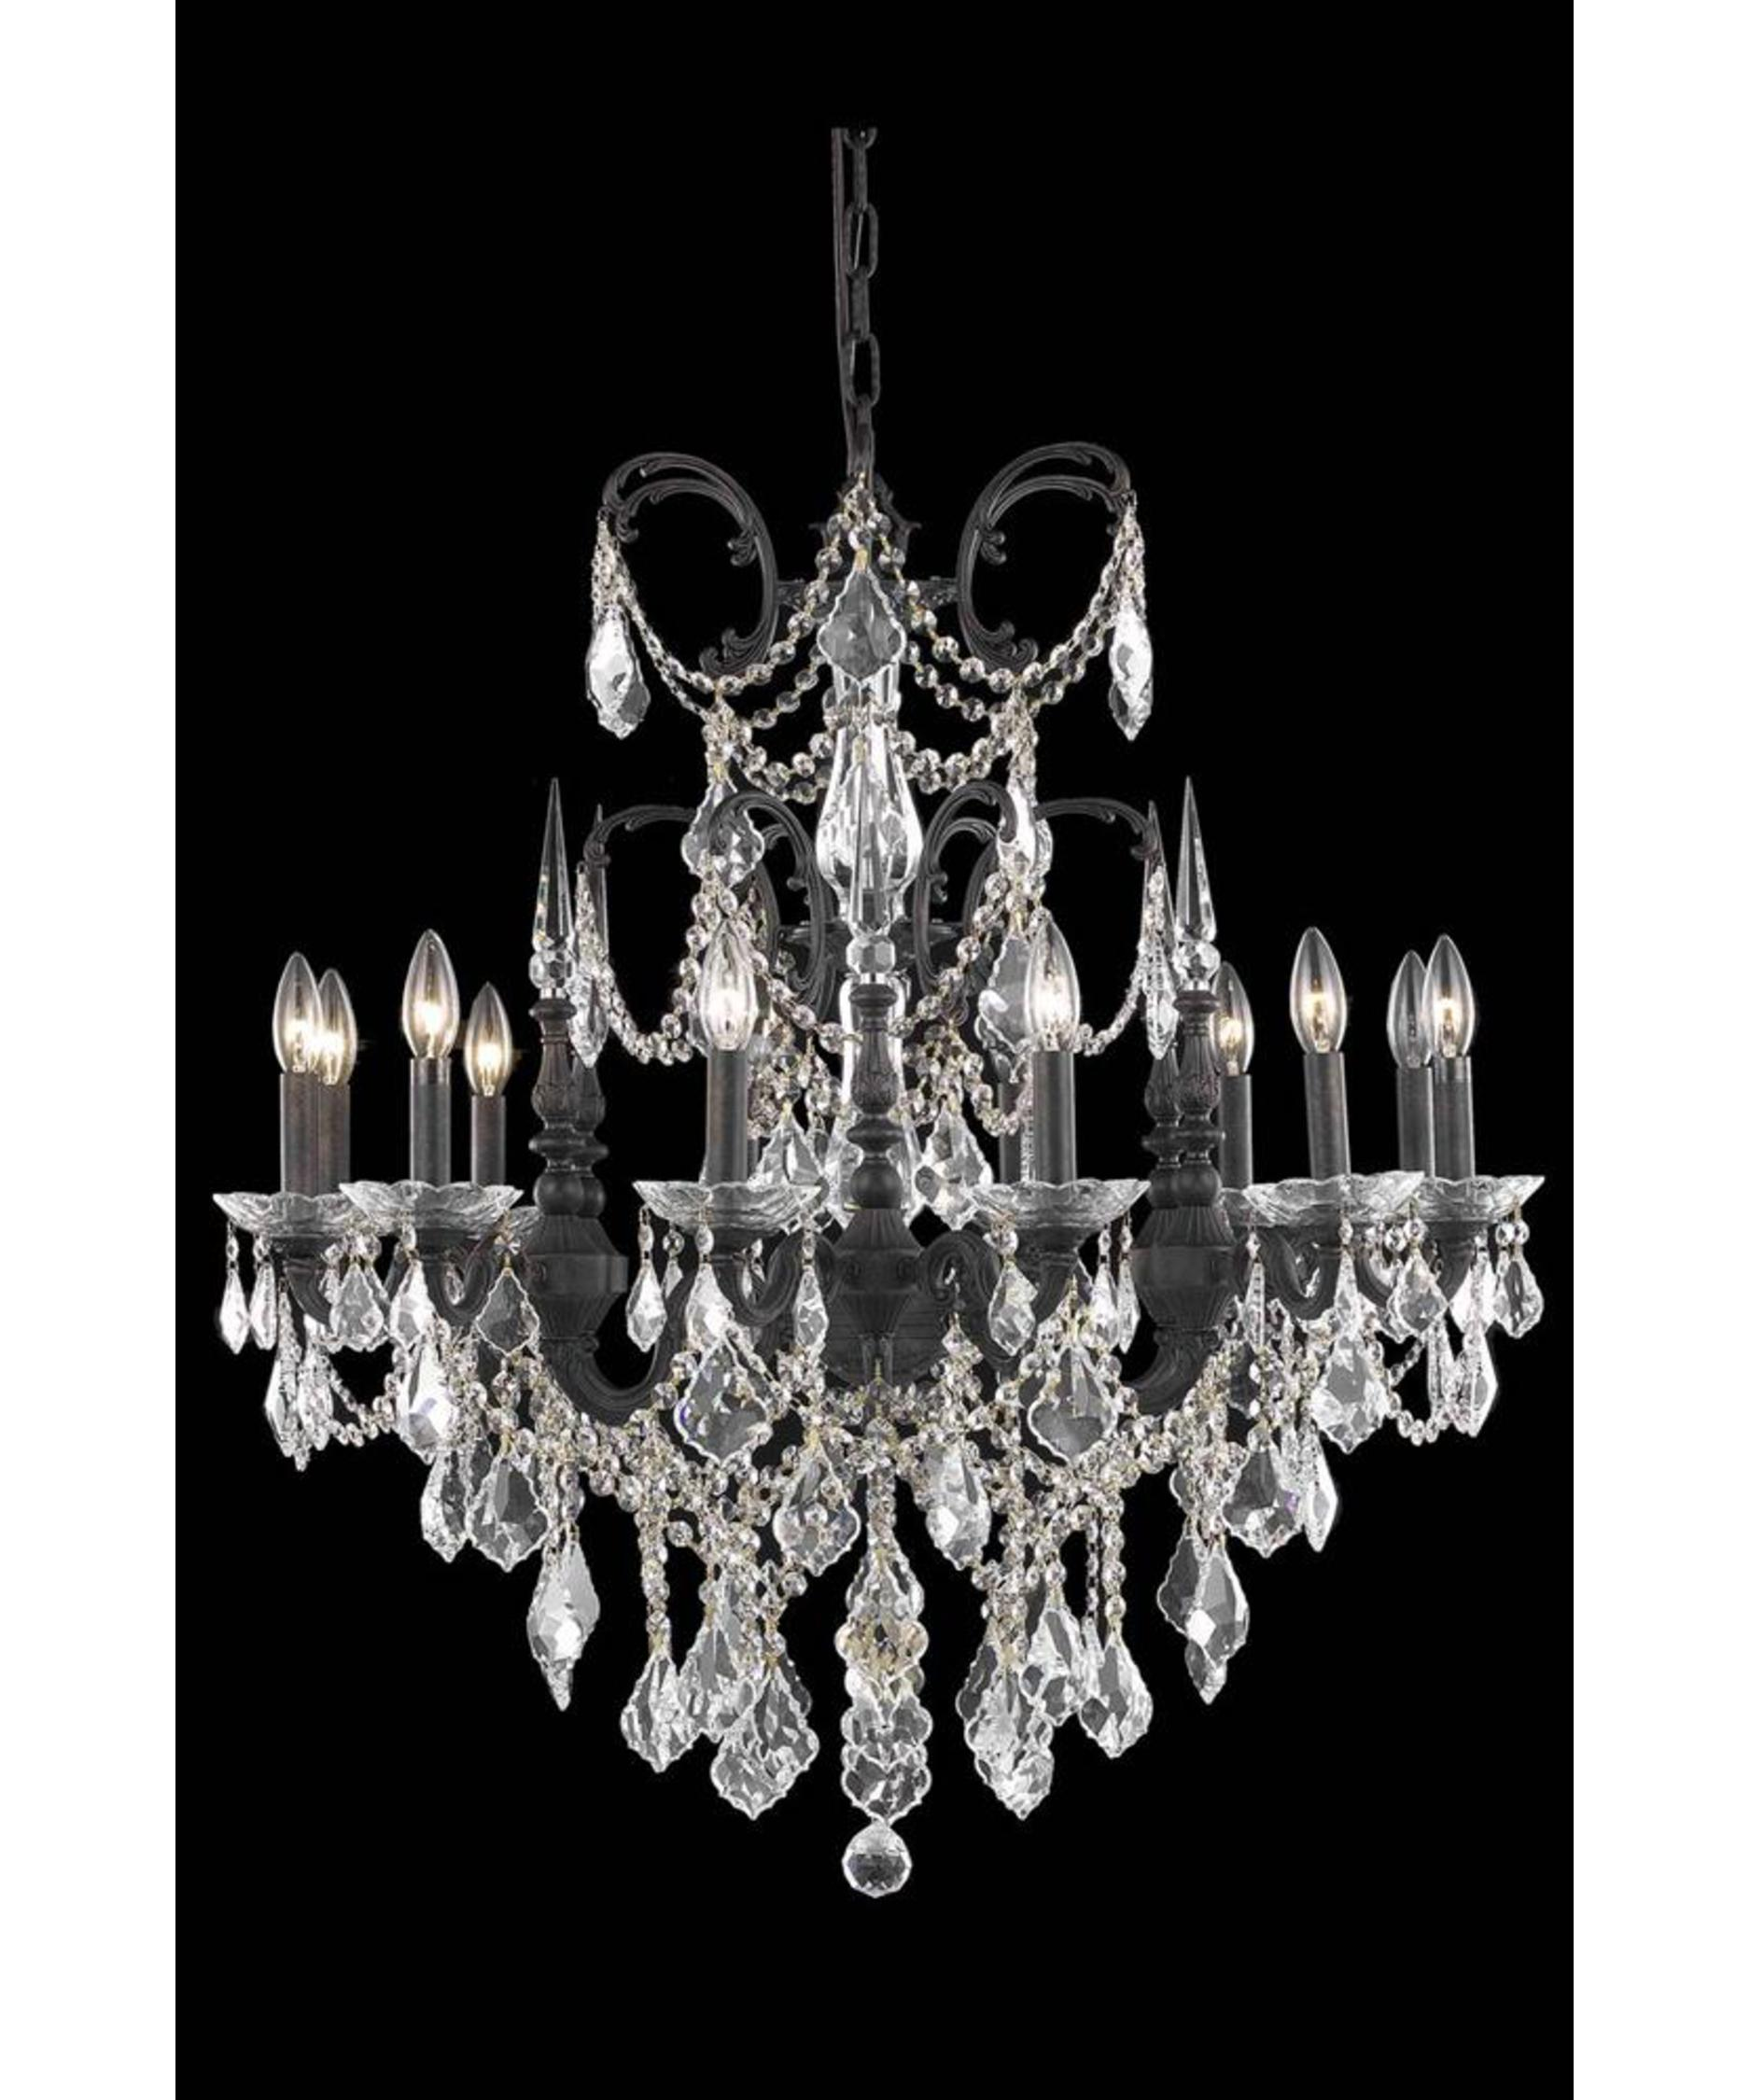 Elegant Lighting Athena 32 Inch Wide 12 Light Chandelier – Antique Bronze Crystal Chandelier